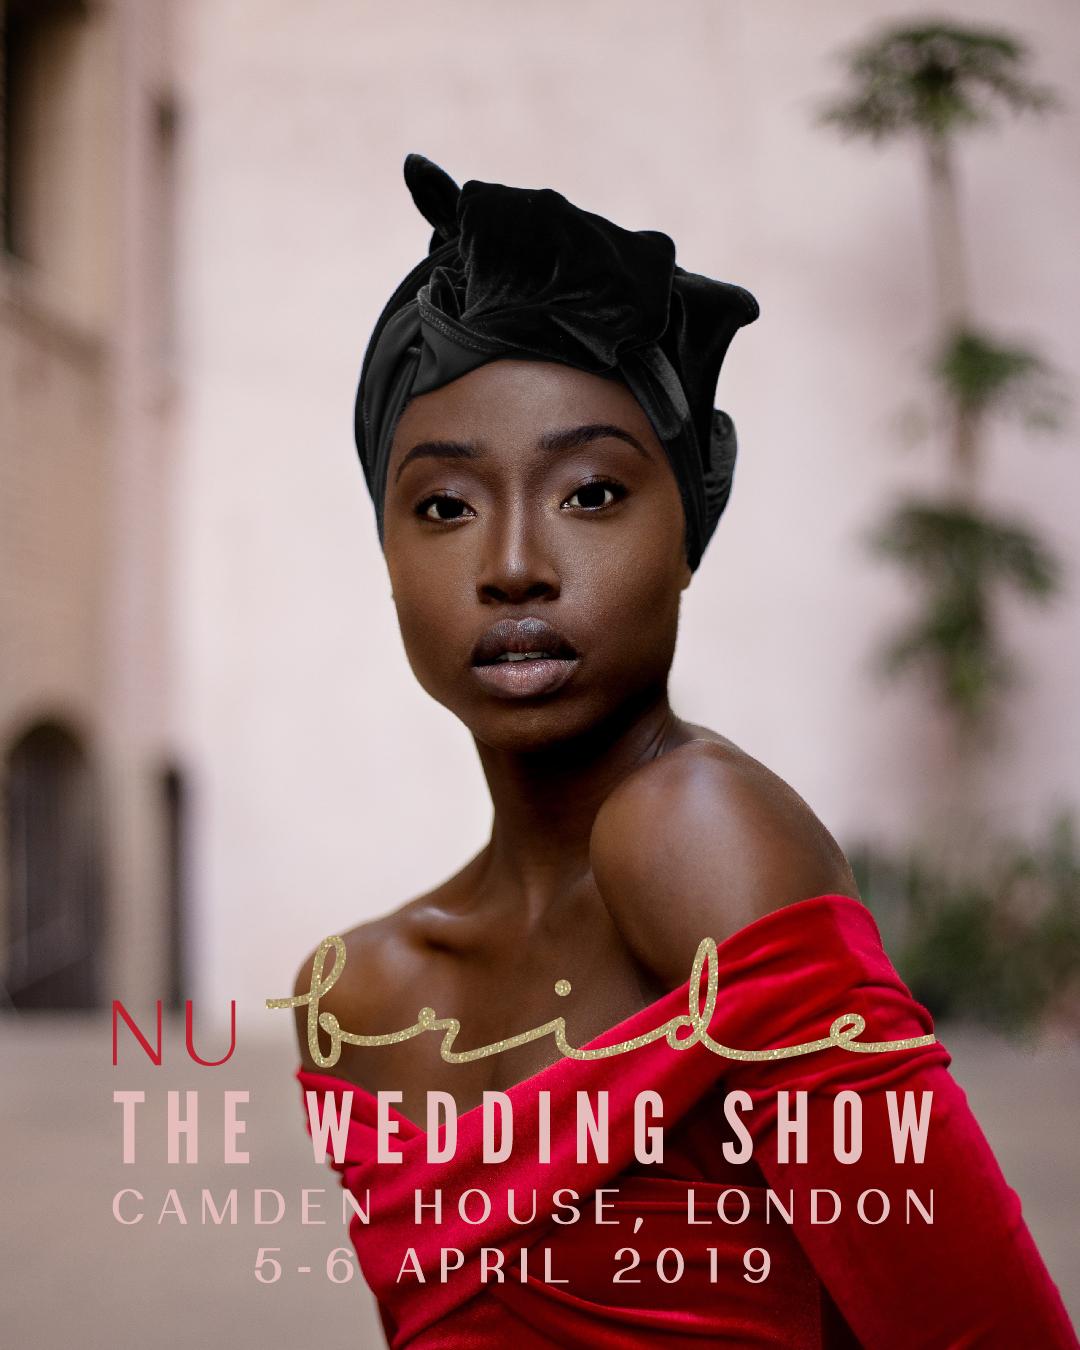 Nu Bride The Wedding Show Camden House, London 5-6 April 2019